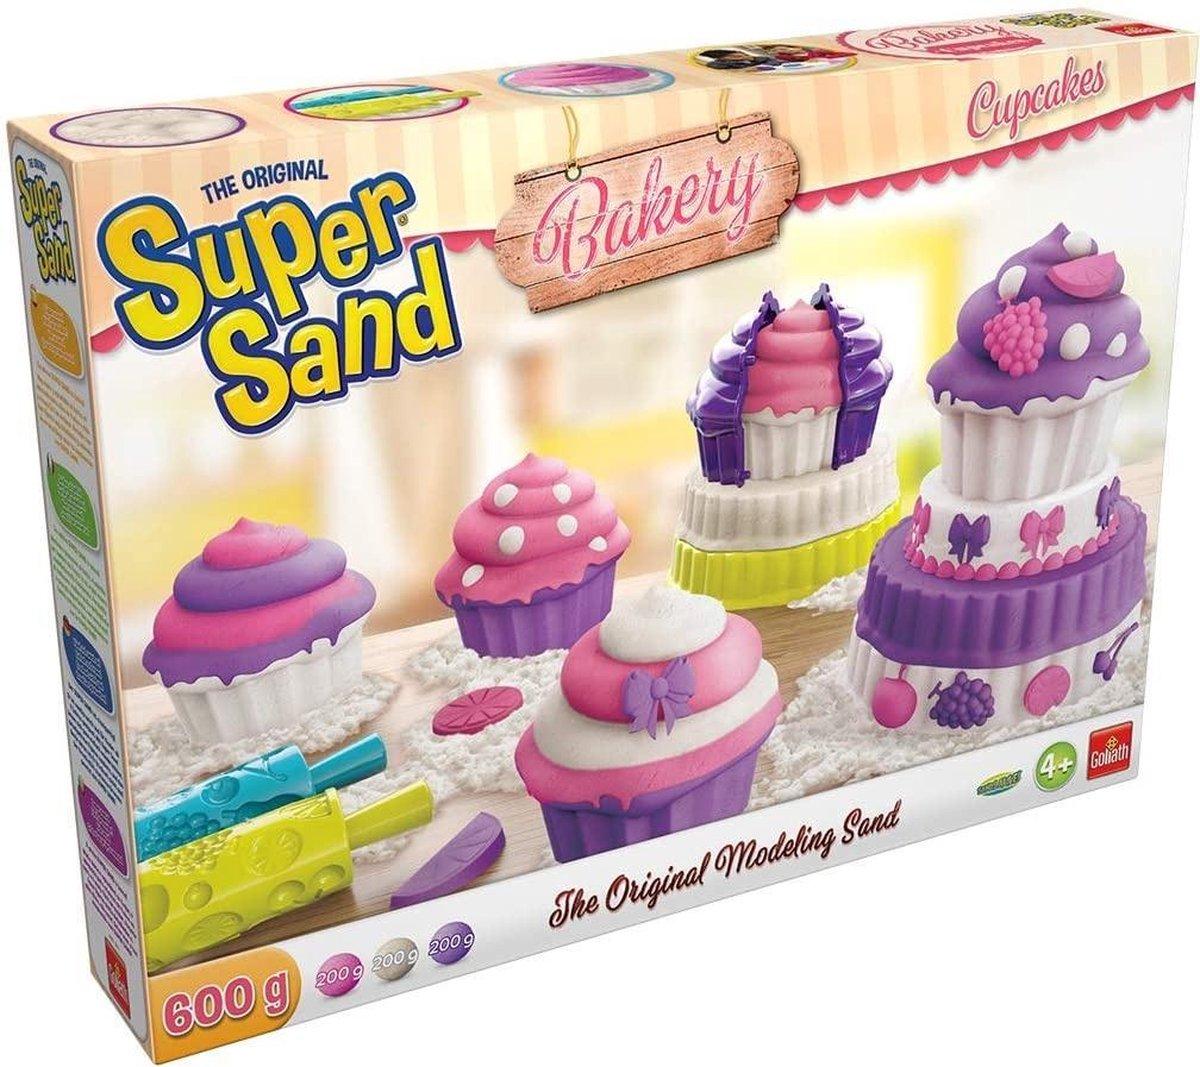 Super Sand Cupcakes - Speelzand